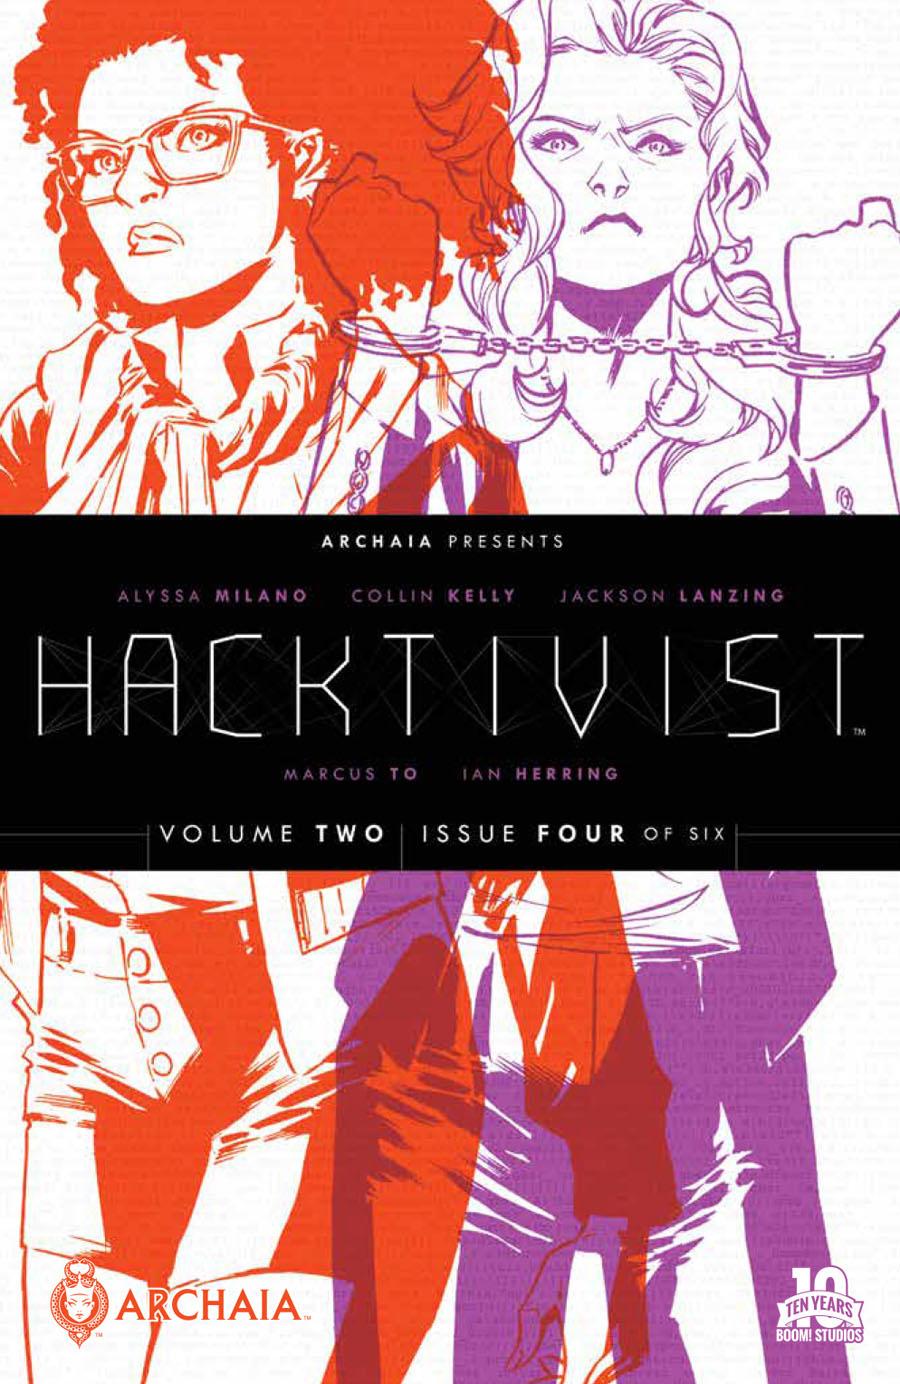 Hacktivist Vol 2 #4